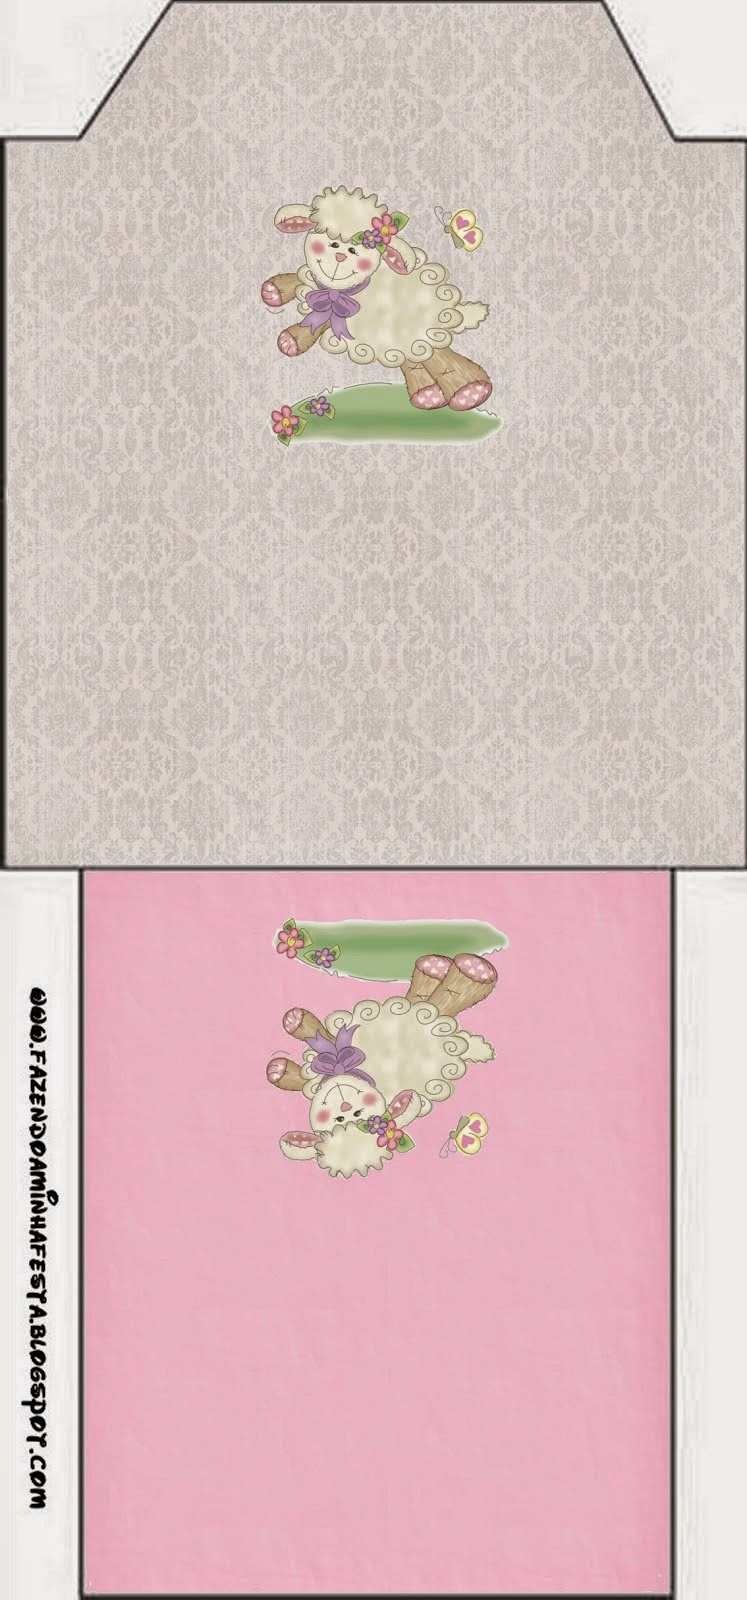 Bolsita de Té para imprimir gratis de Ovejita en Fondo Rosa.